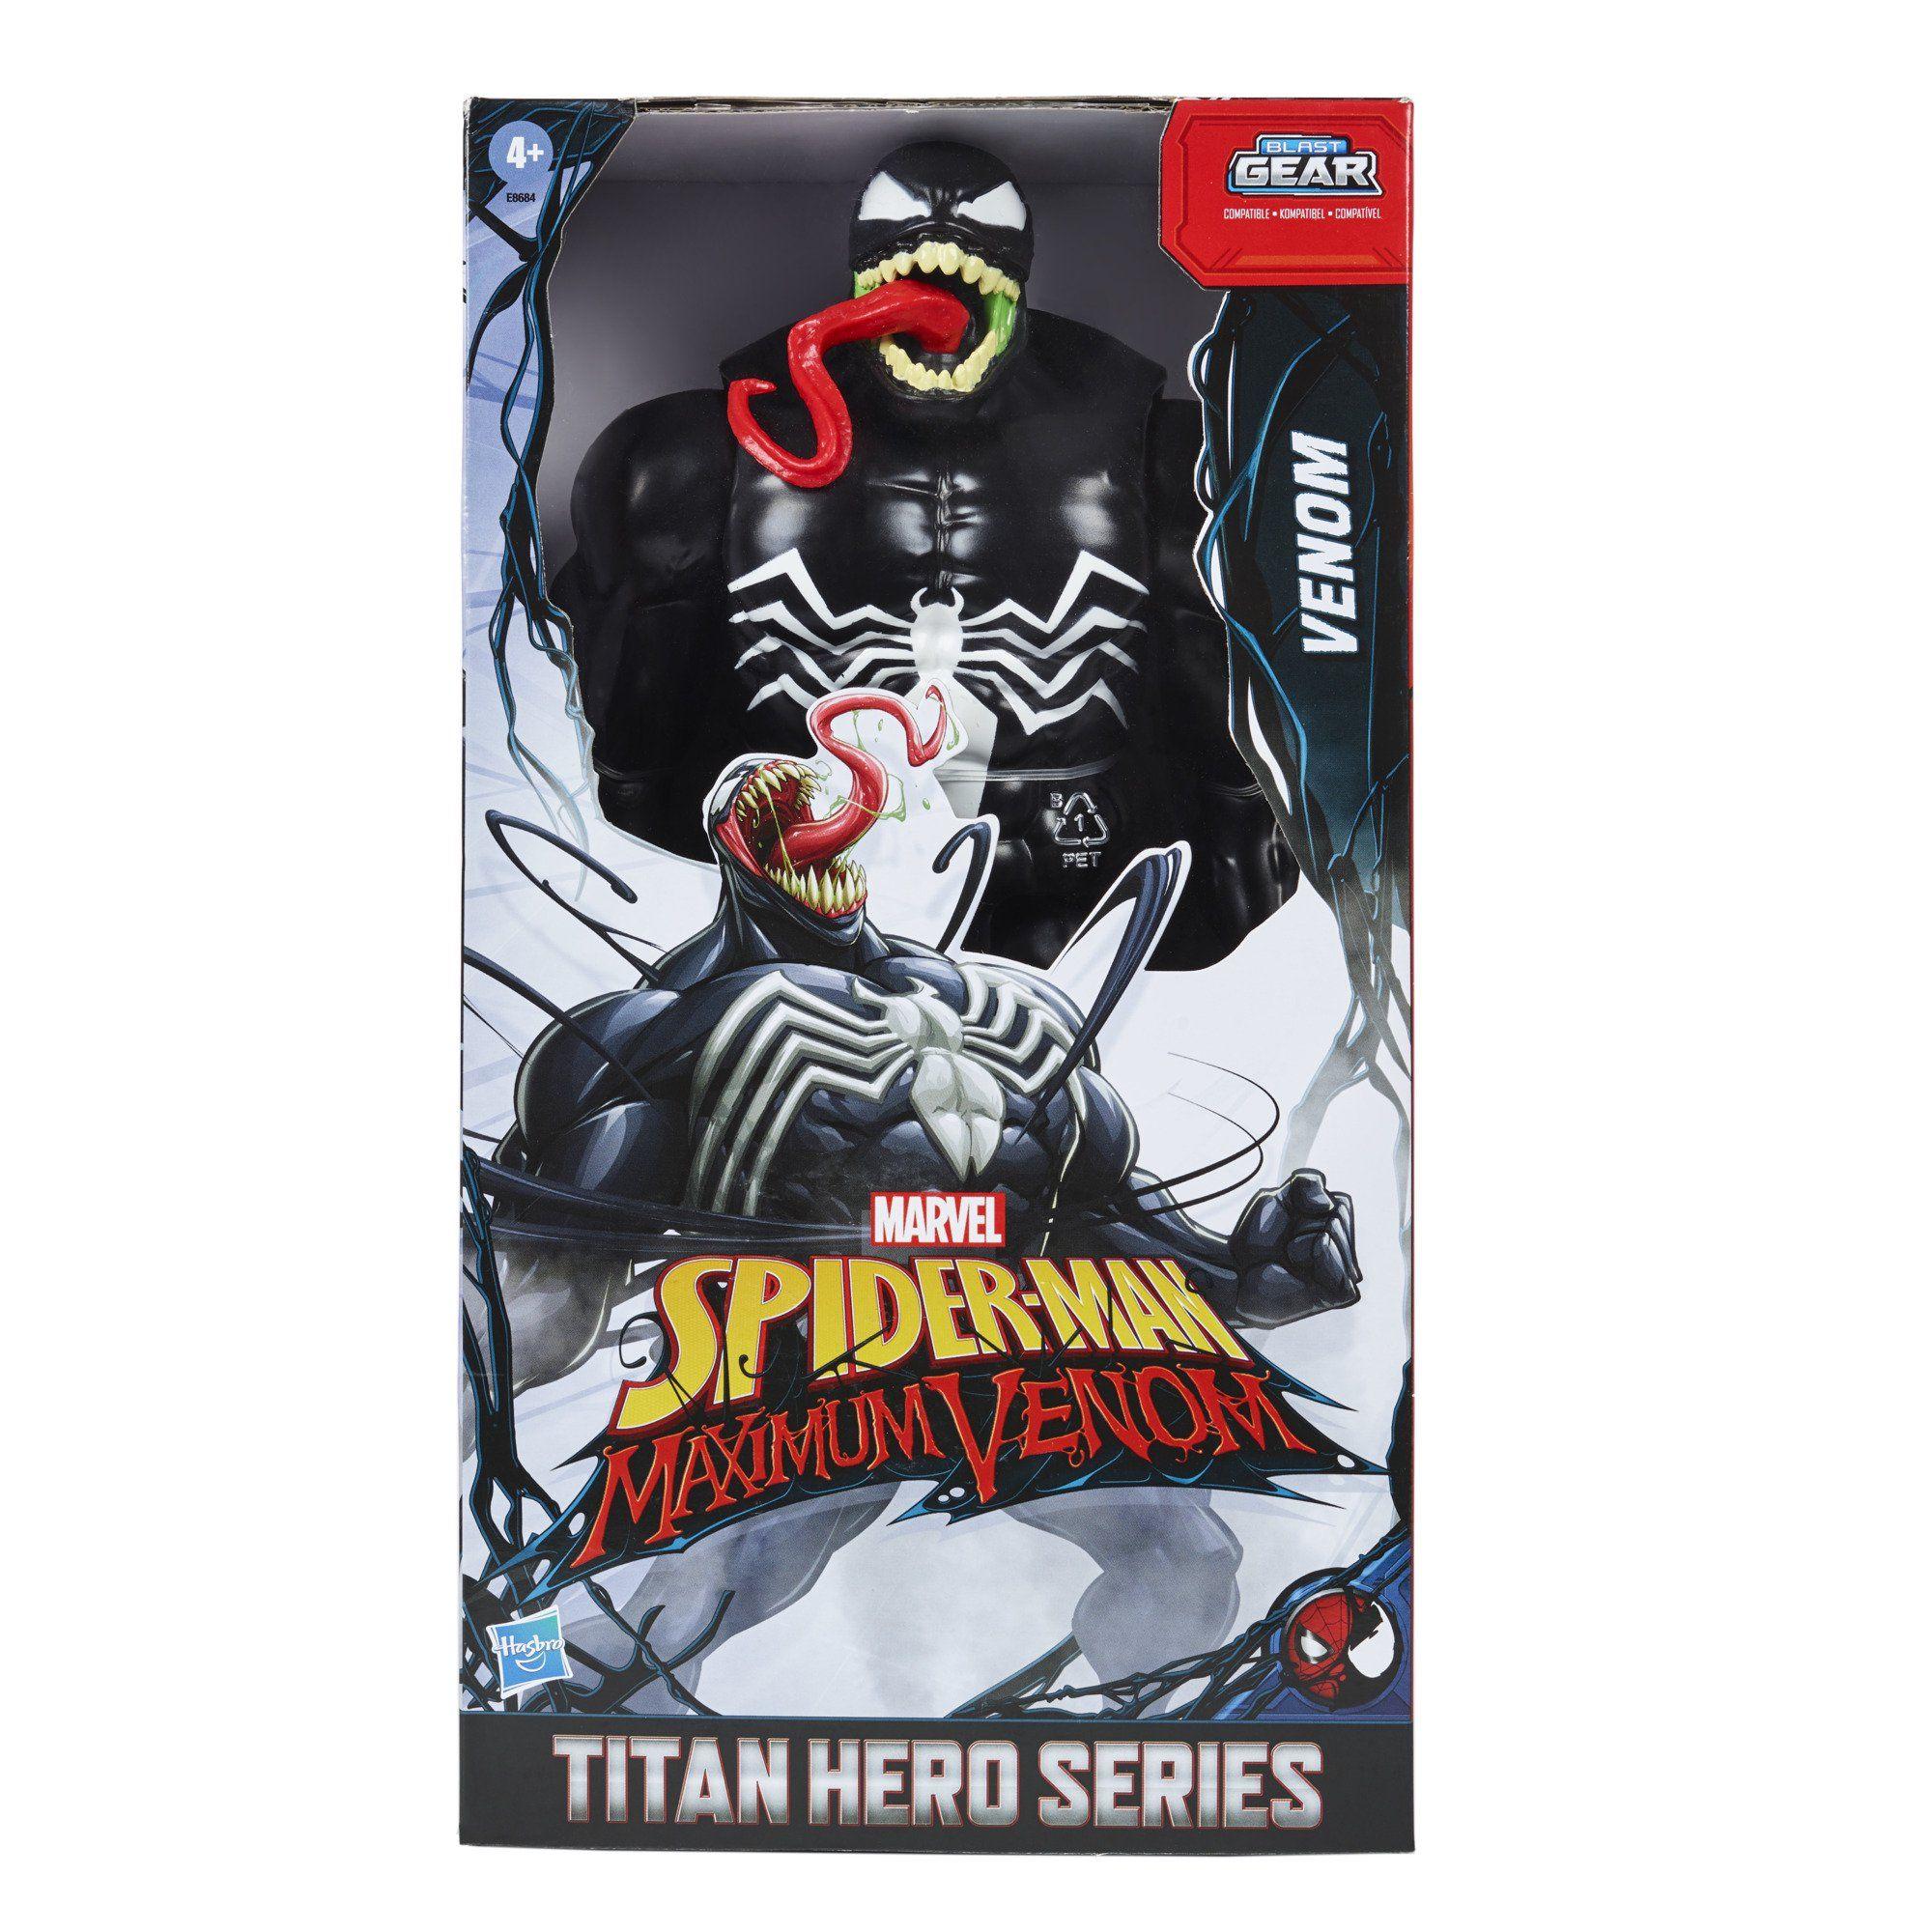 Spider Man Maximum Venom Titan Hero Venom Walmart Com Spiderman Marvel Spiderman Venom